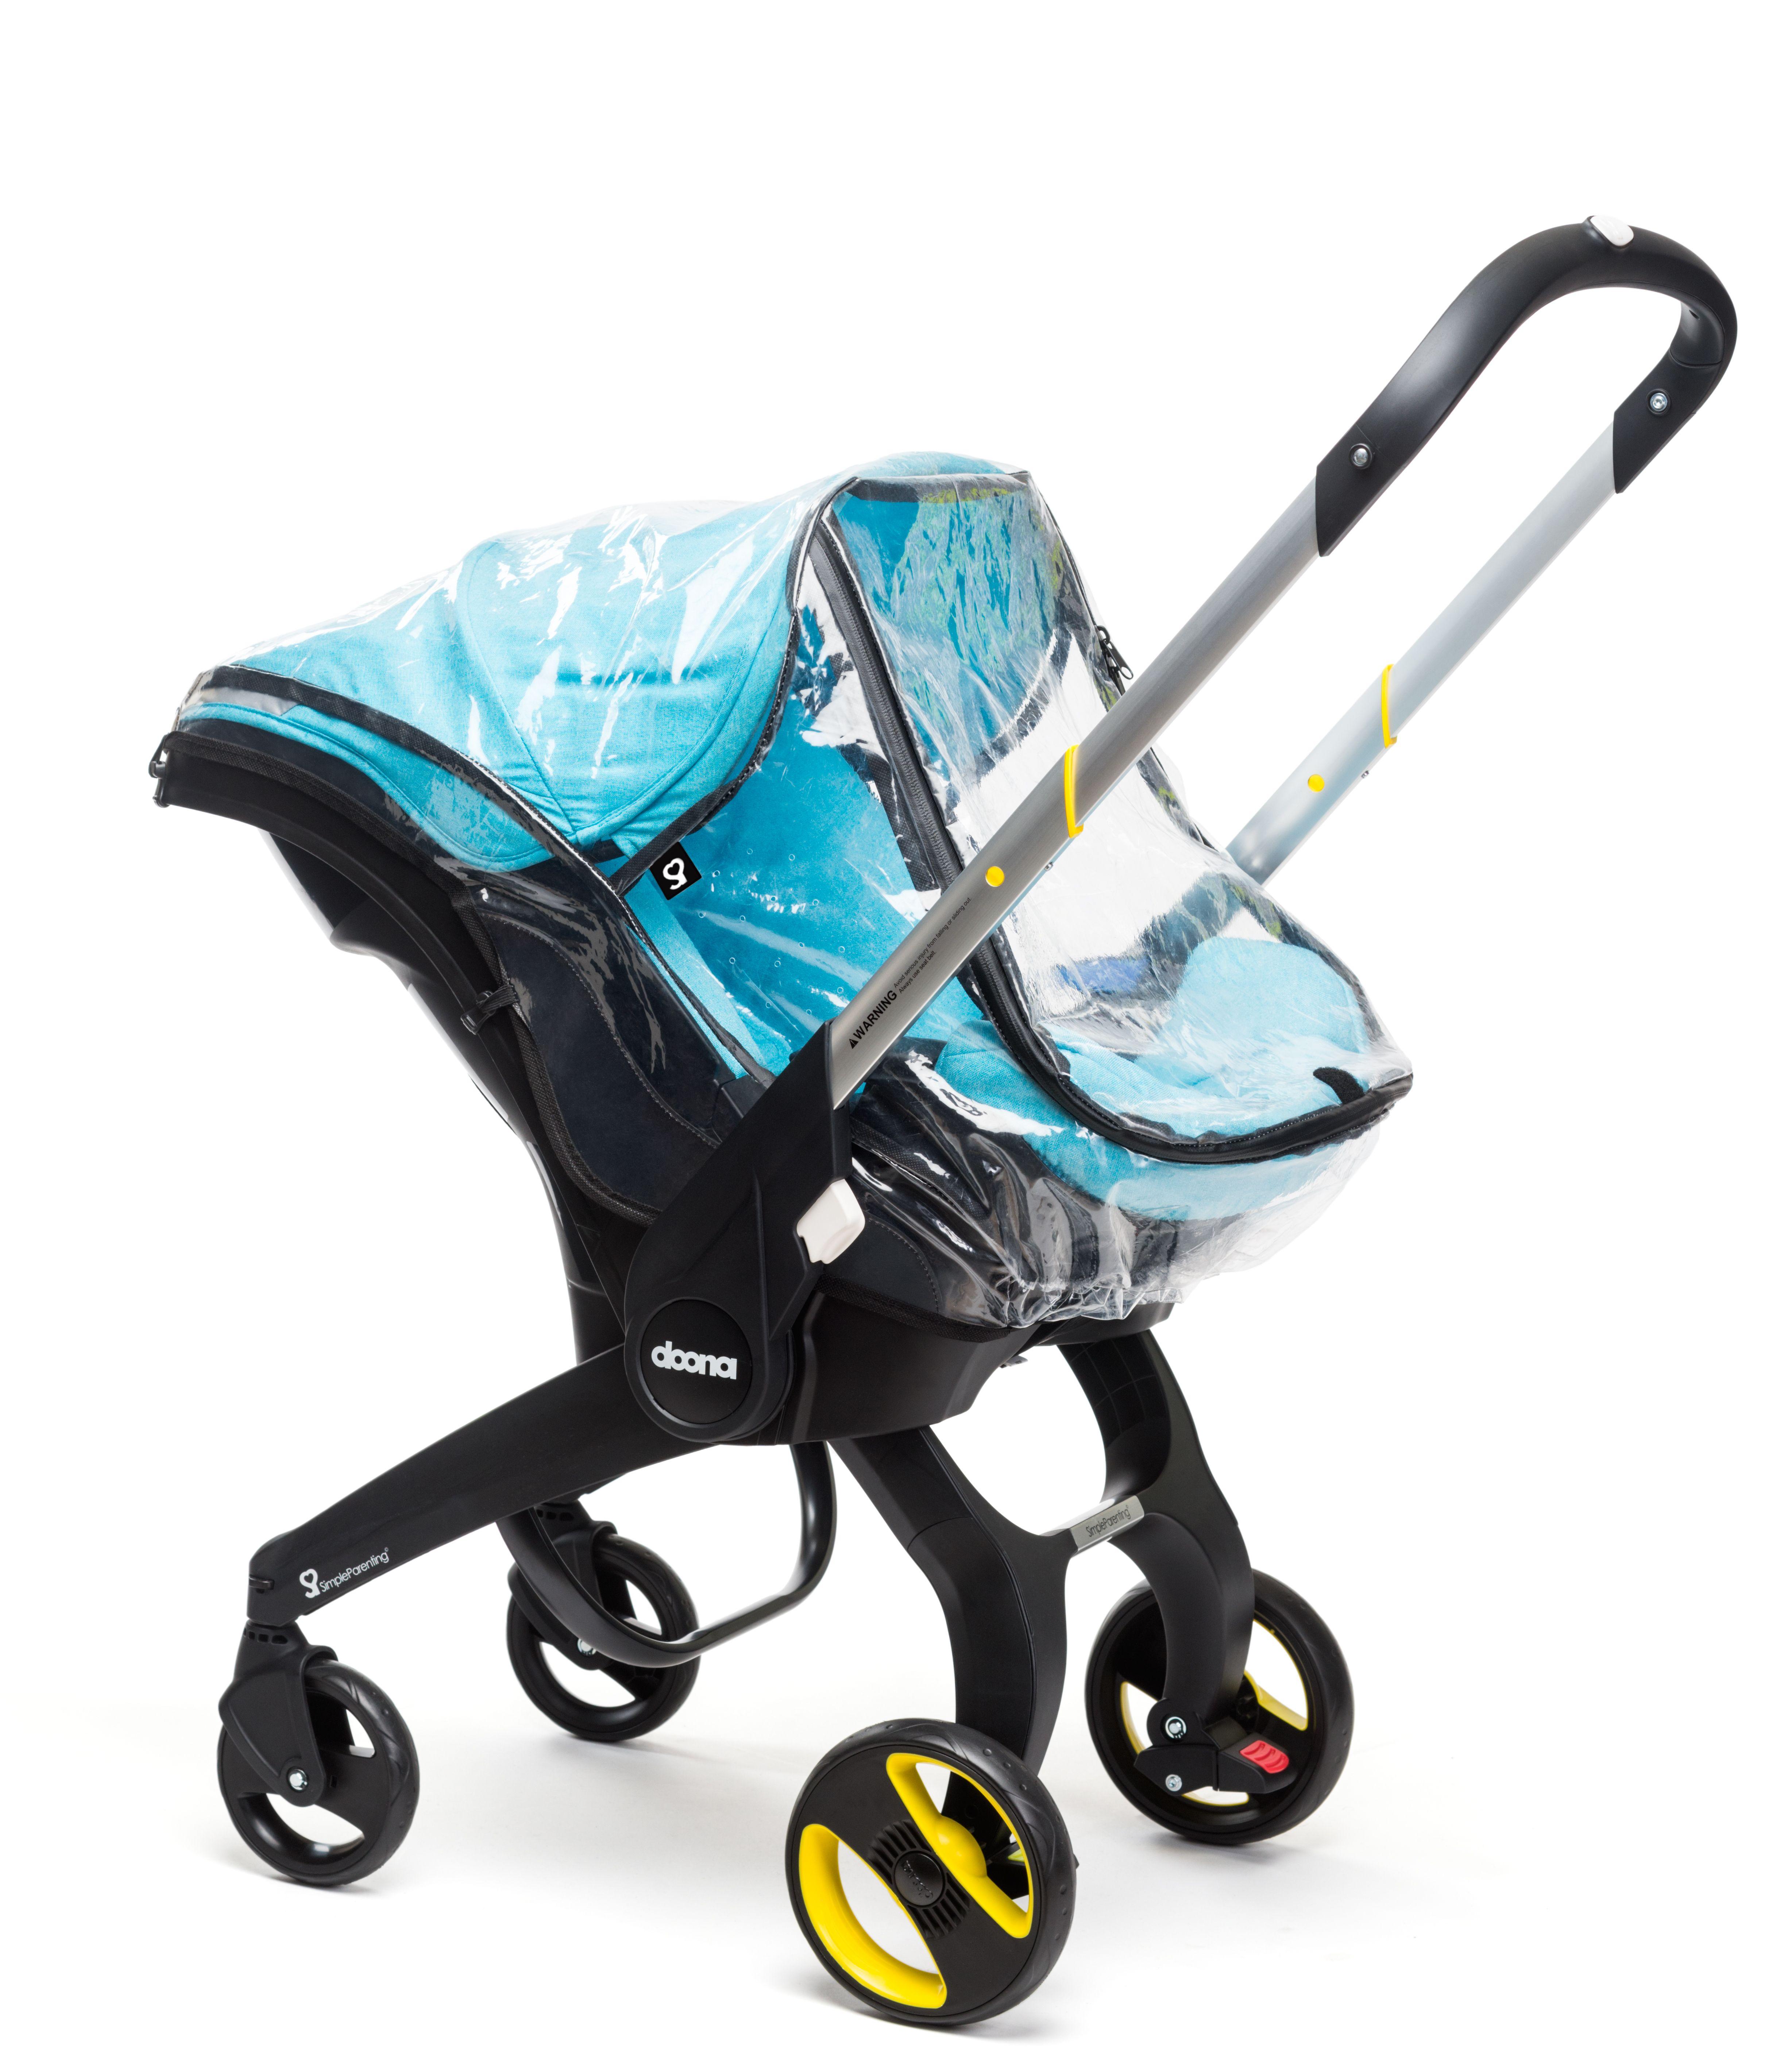 Doona Car Seat Stroller + Base 2019/2020 Baby car seats